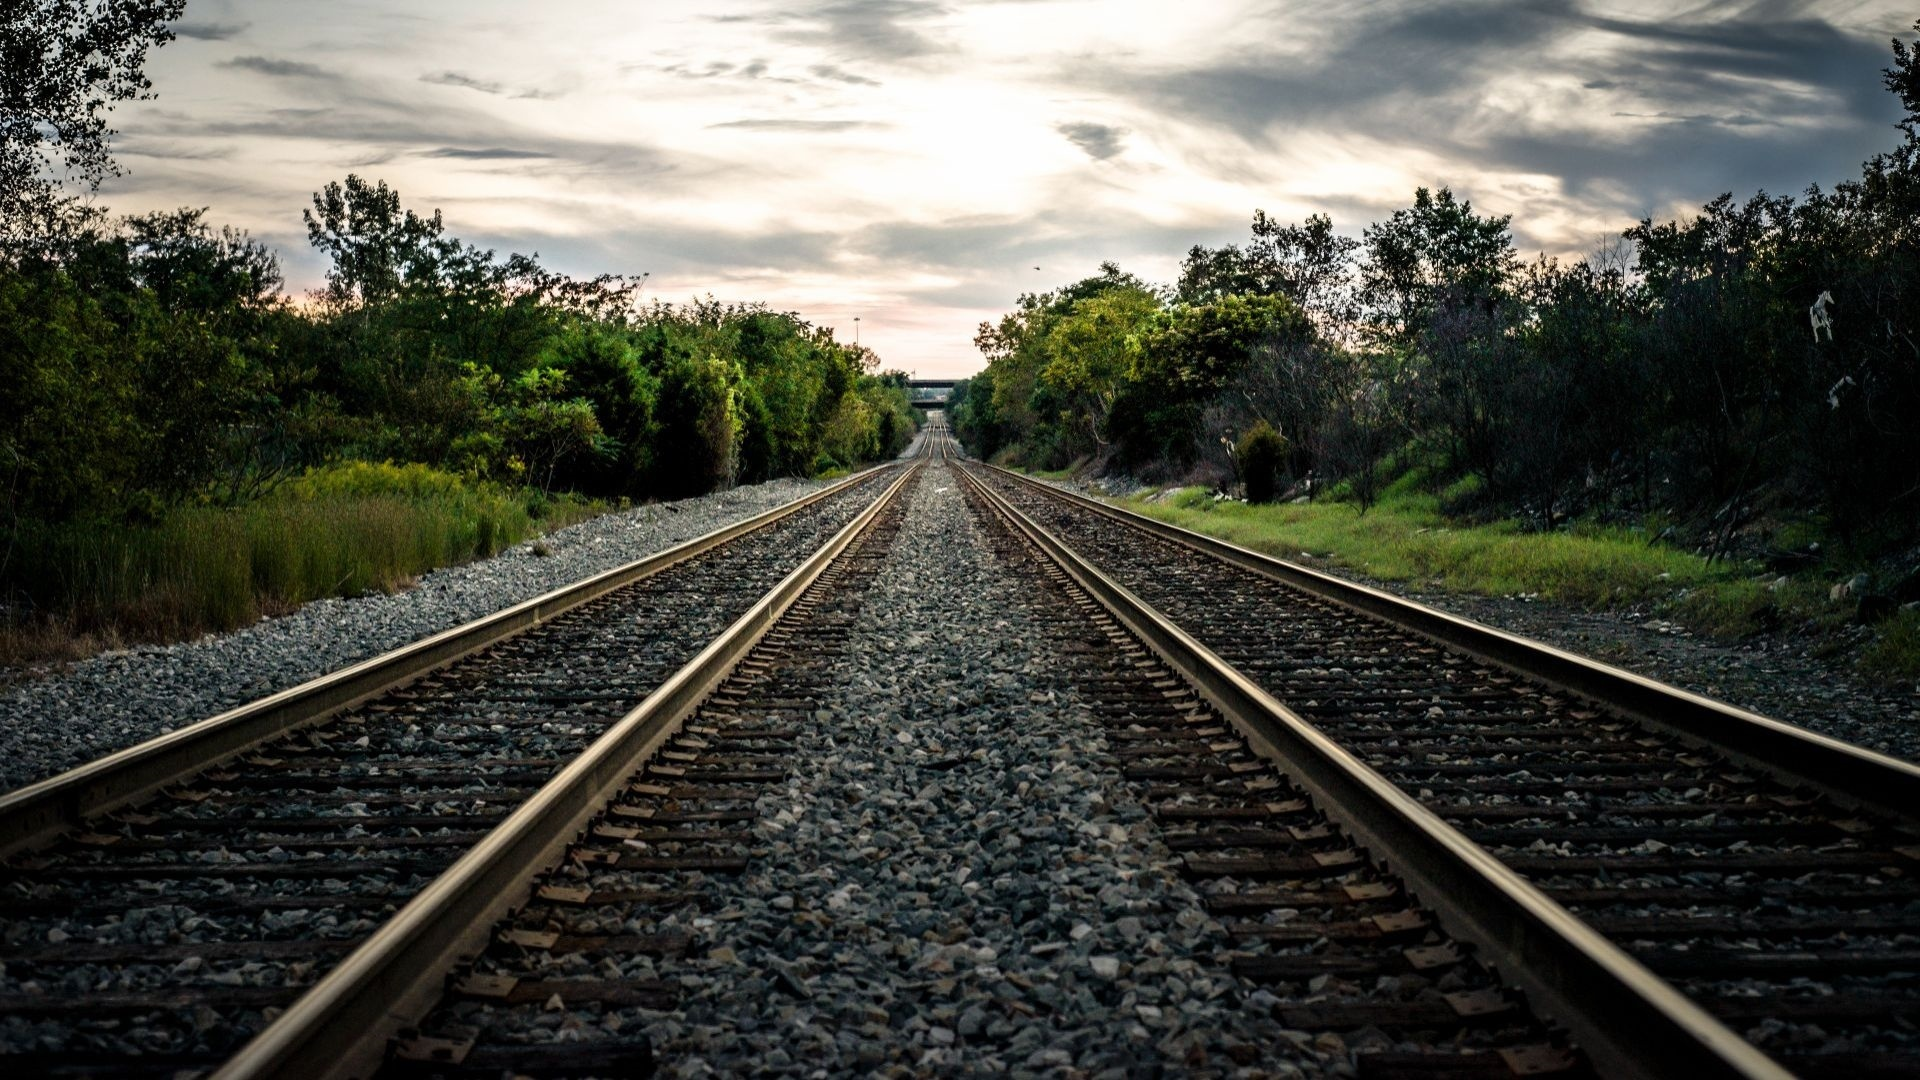 Railroad desktop wallpaper hd